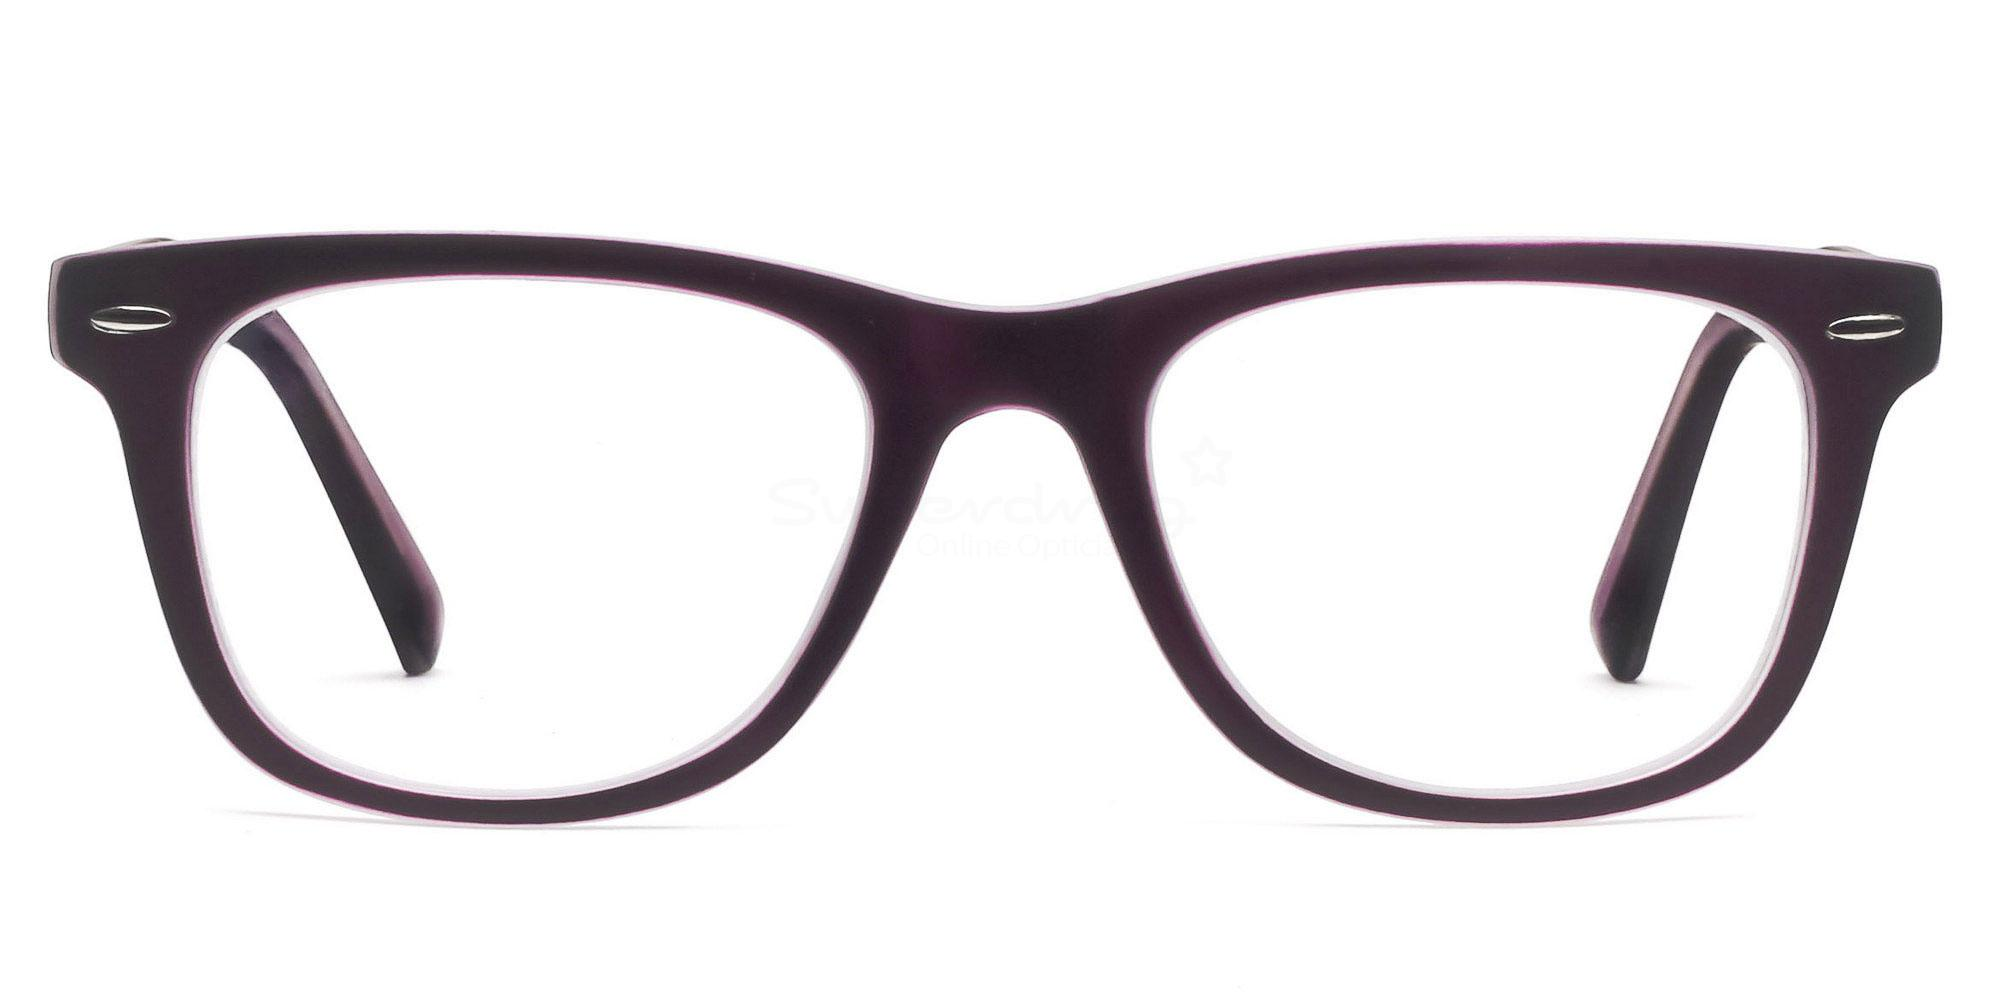 C12 8121 - Purple on Transparent Glasses, Helium